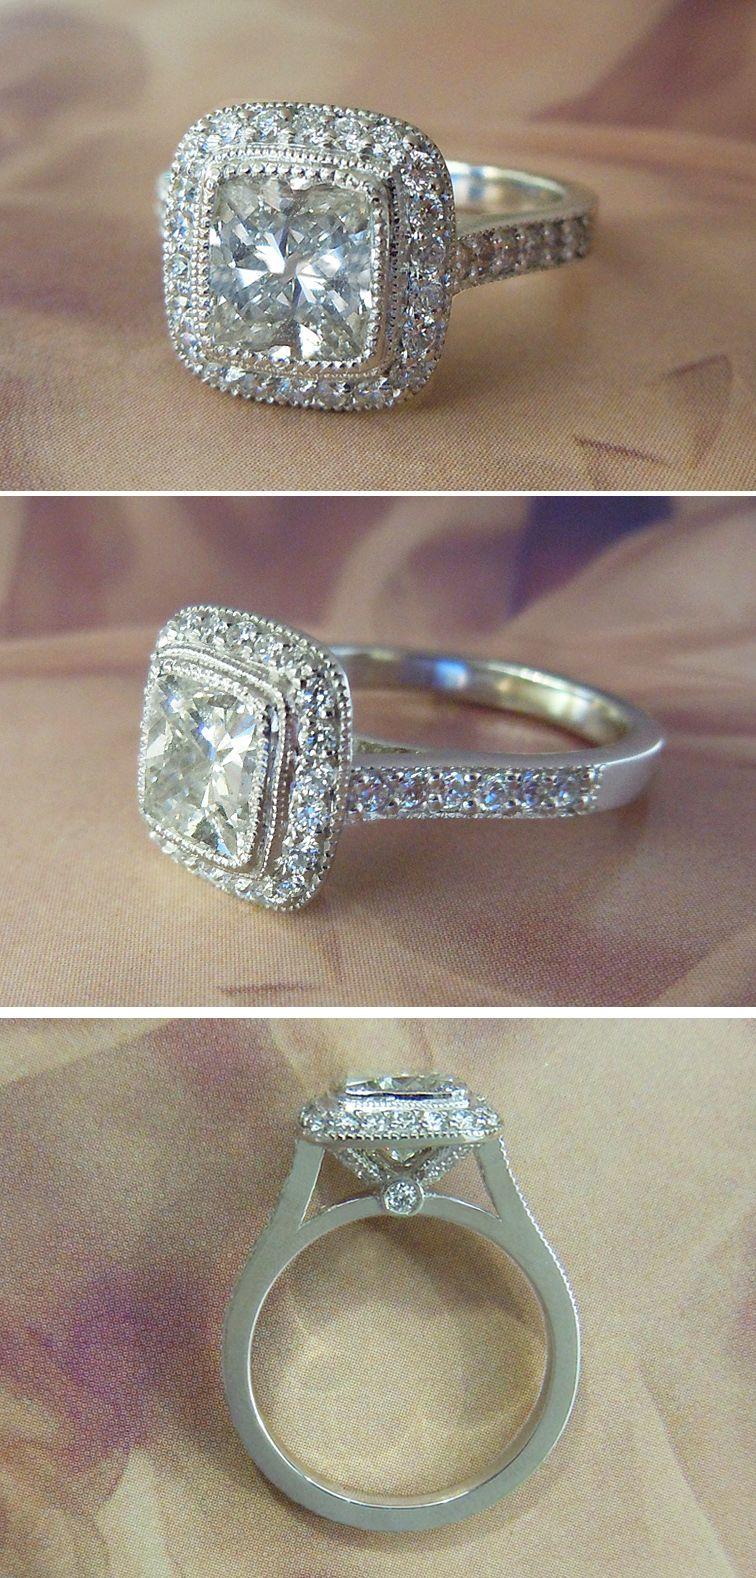 Ring · Platinum 2 Carat Vs2 Cushion Cut Diamond Halo